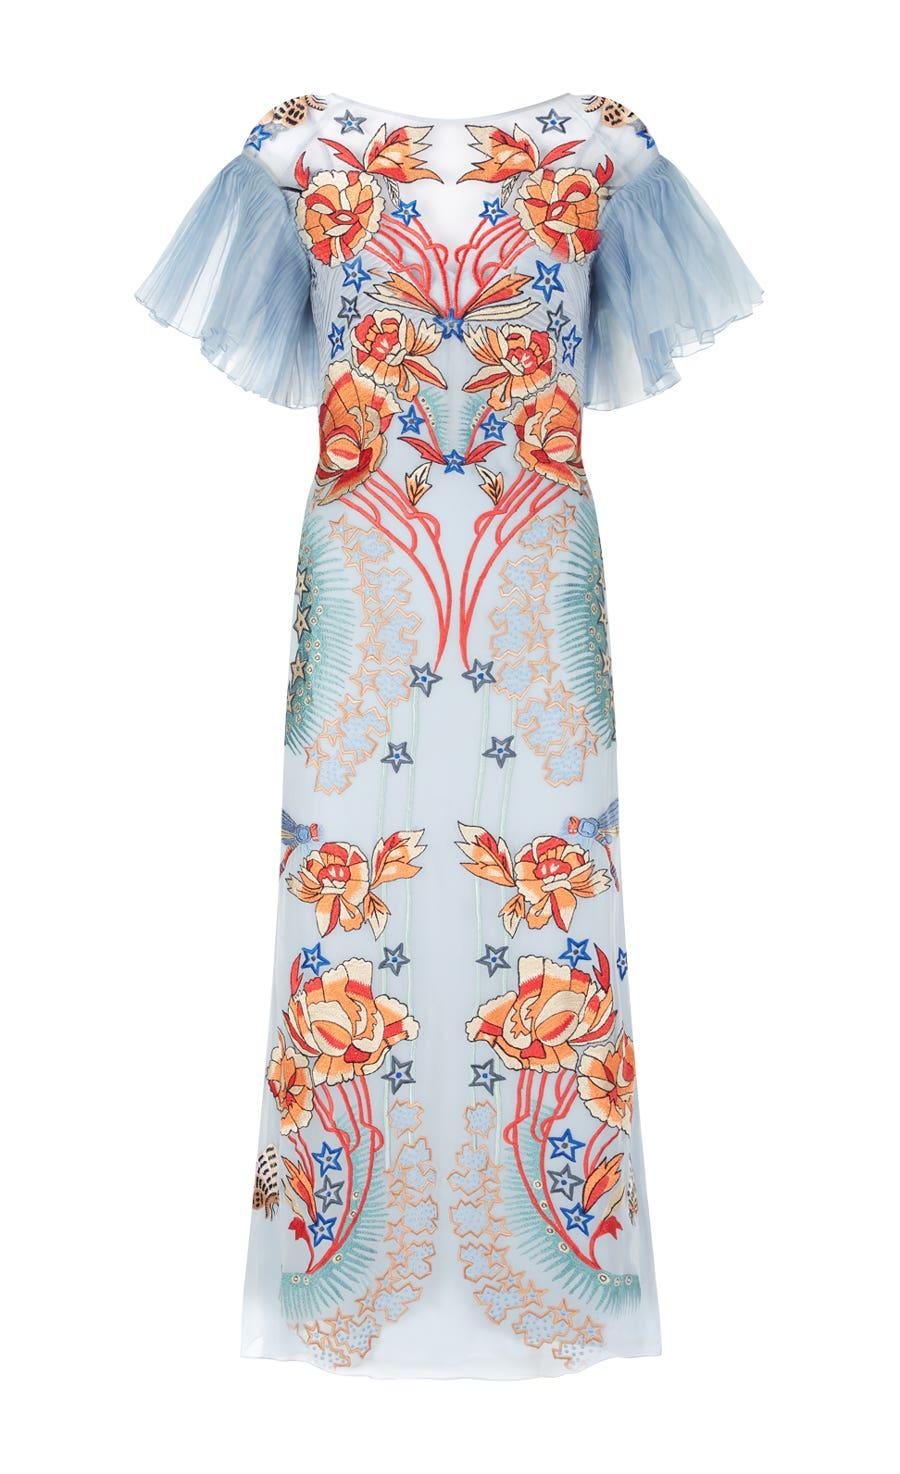 Porcelain Sleeved Dress, Periwinkle Mix